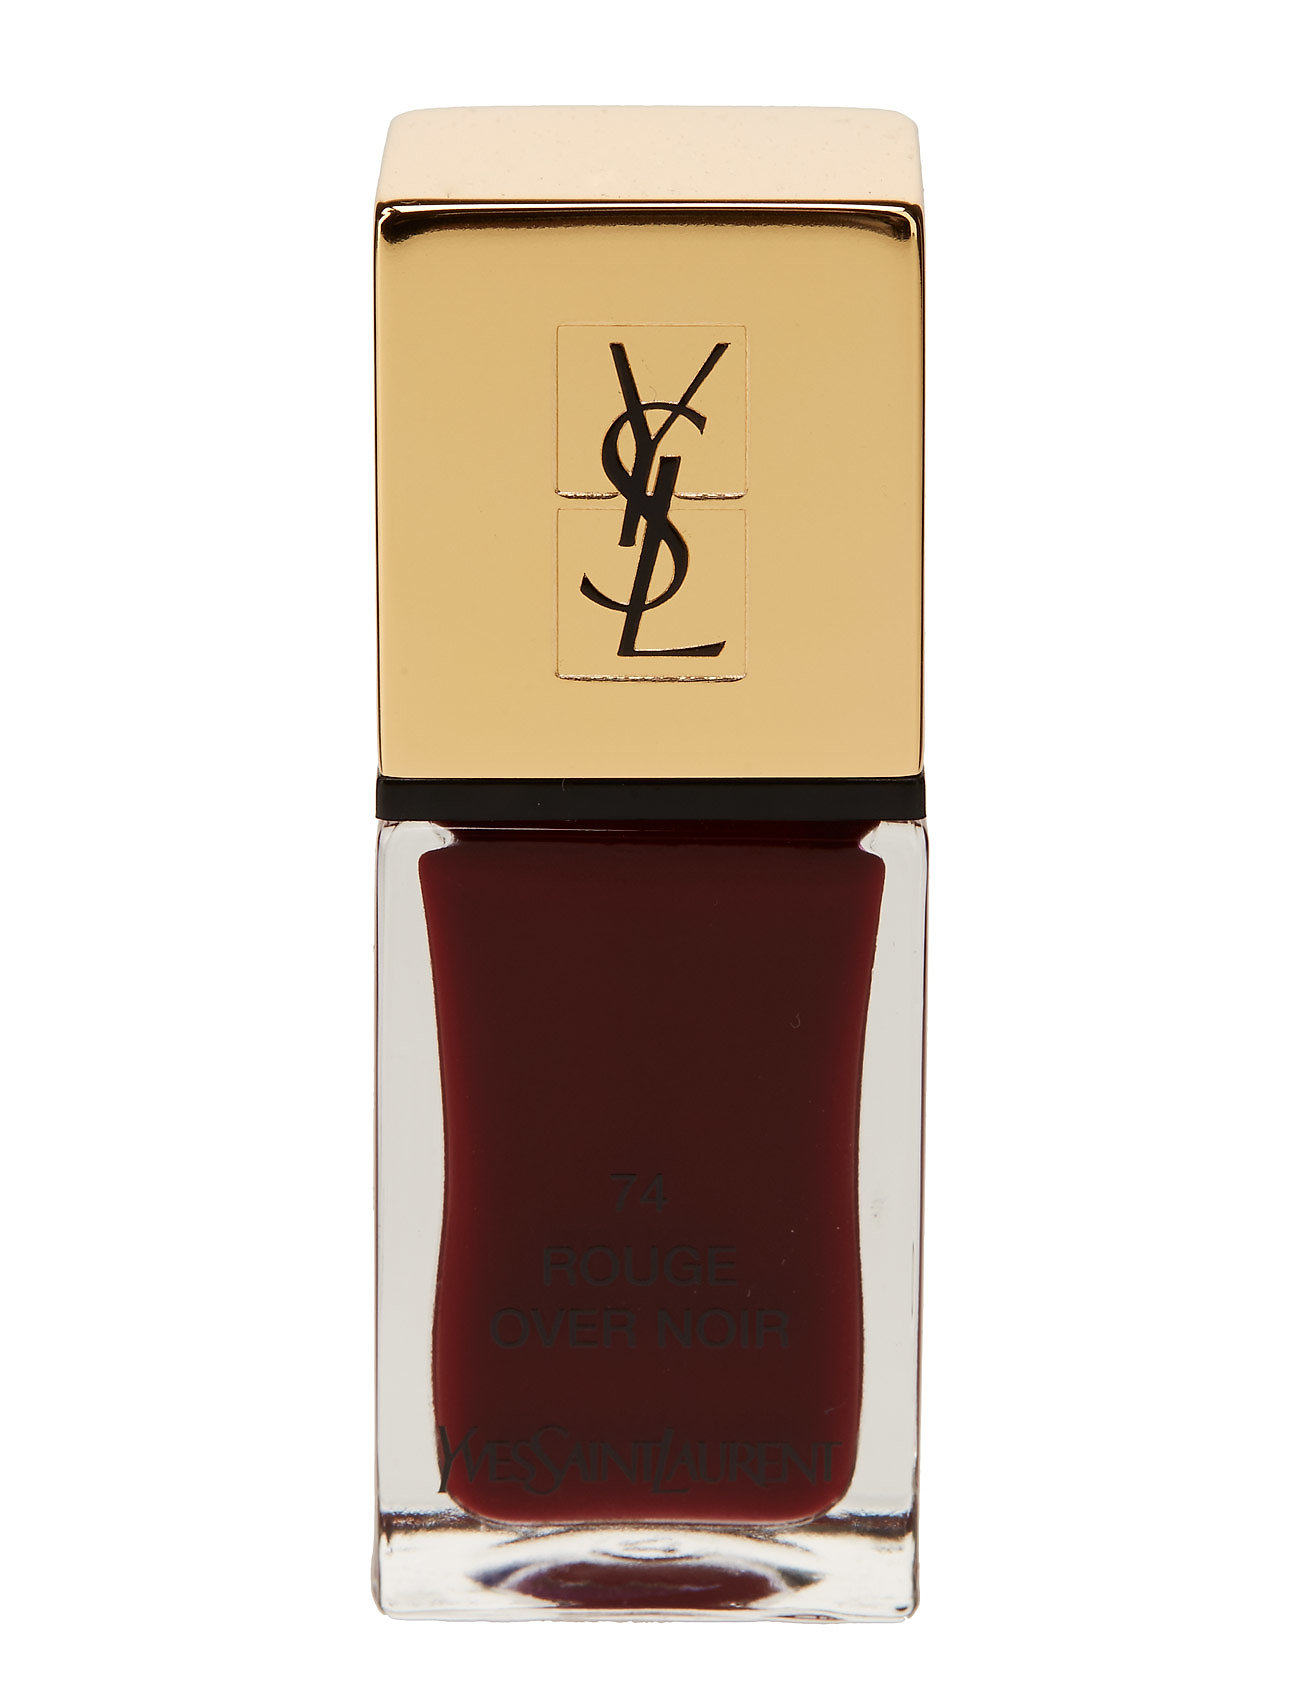 Köpa billiga La Laque Couture online